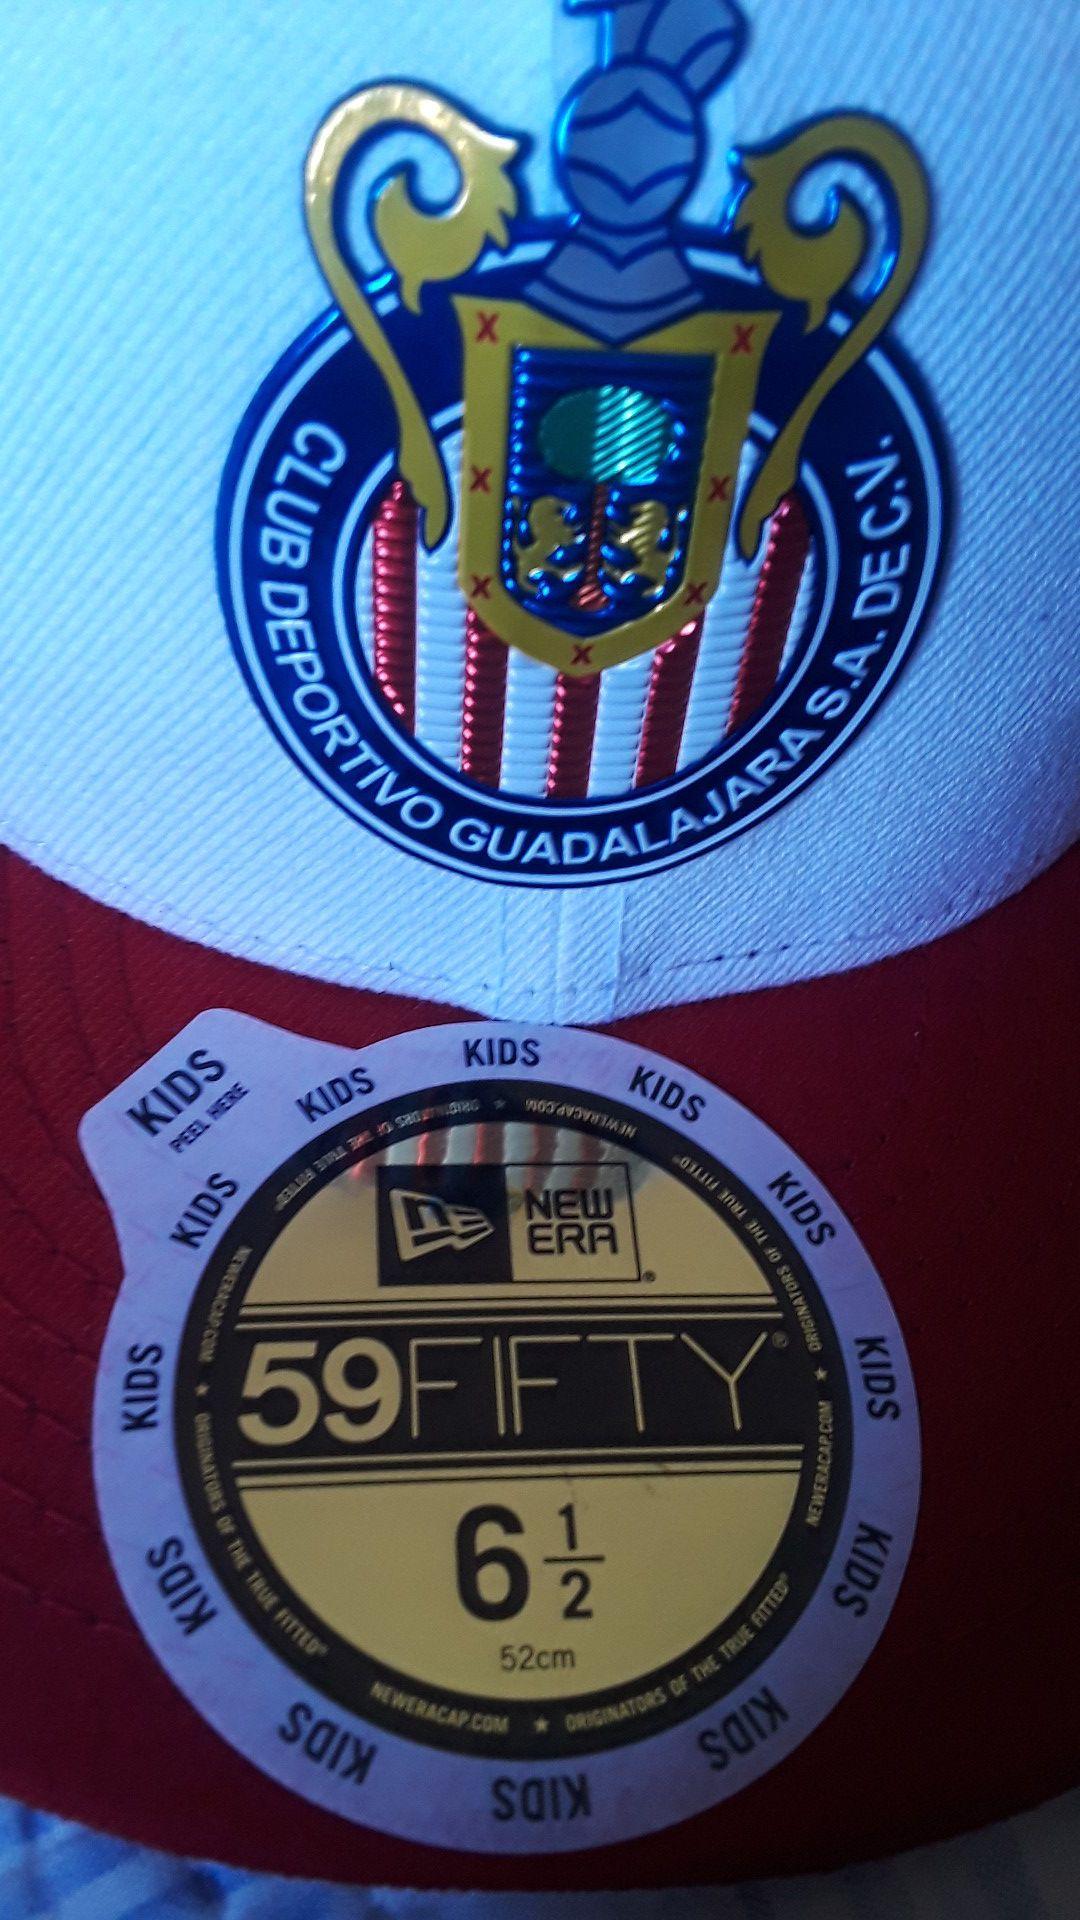 Gorra de chivas para niño , for kid chivas hat